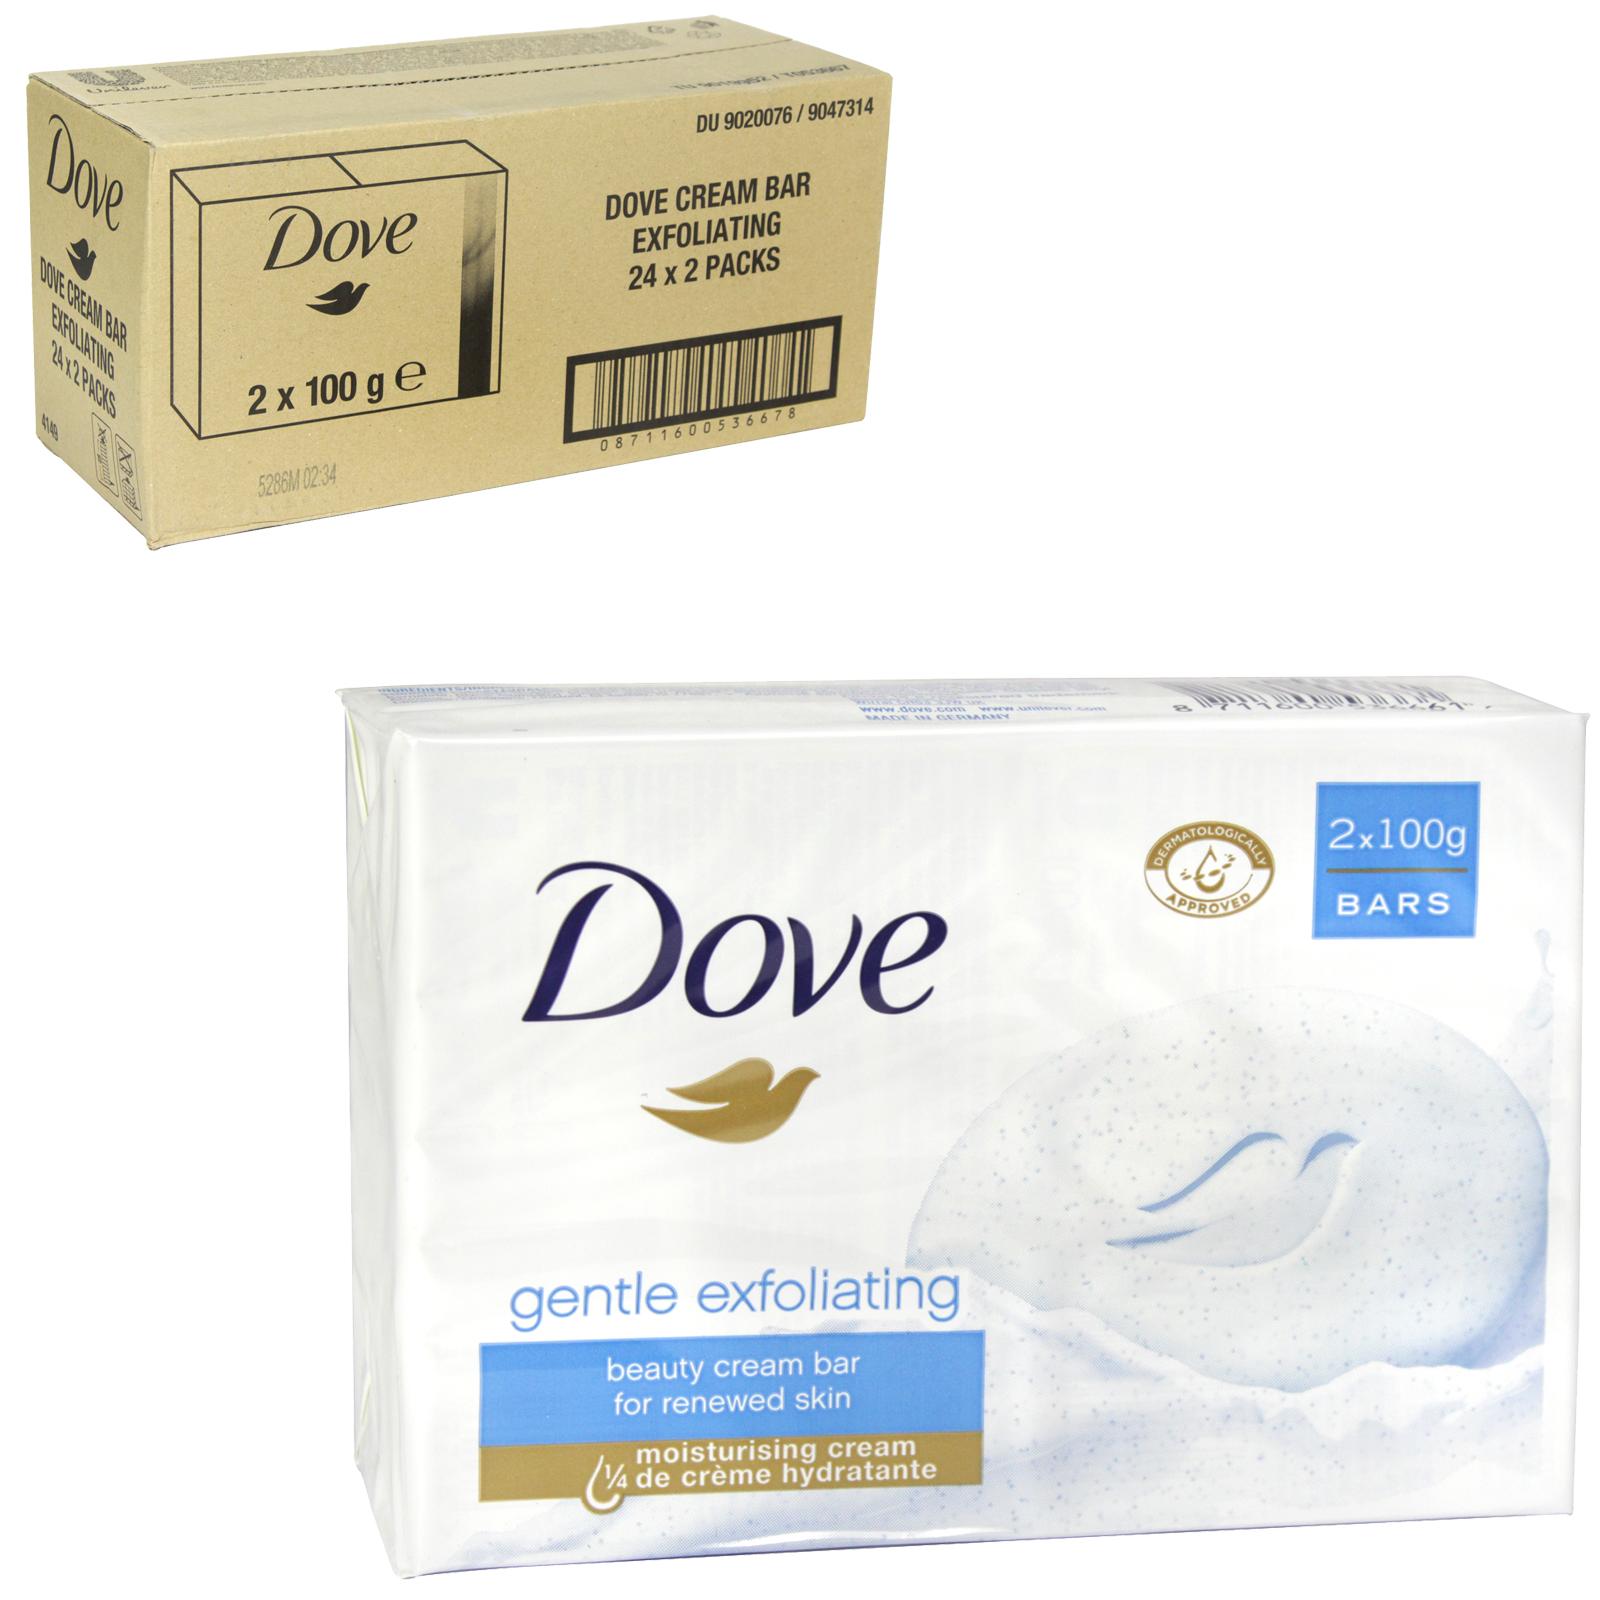 DOVE SOAP 2X100GM EXFOLIATING X 24